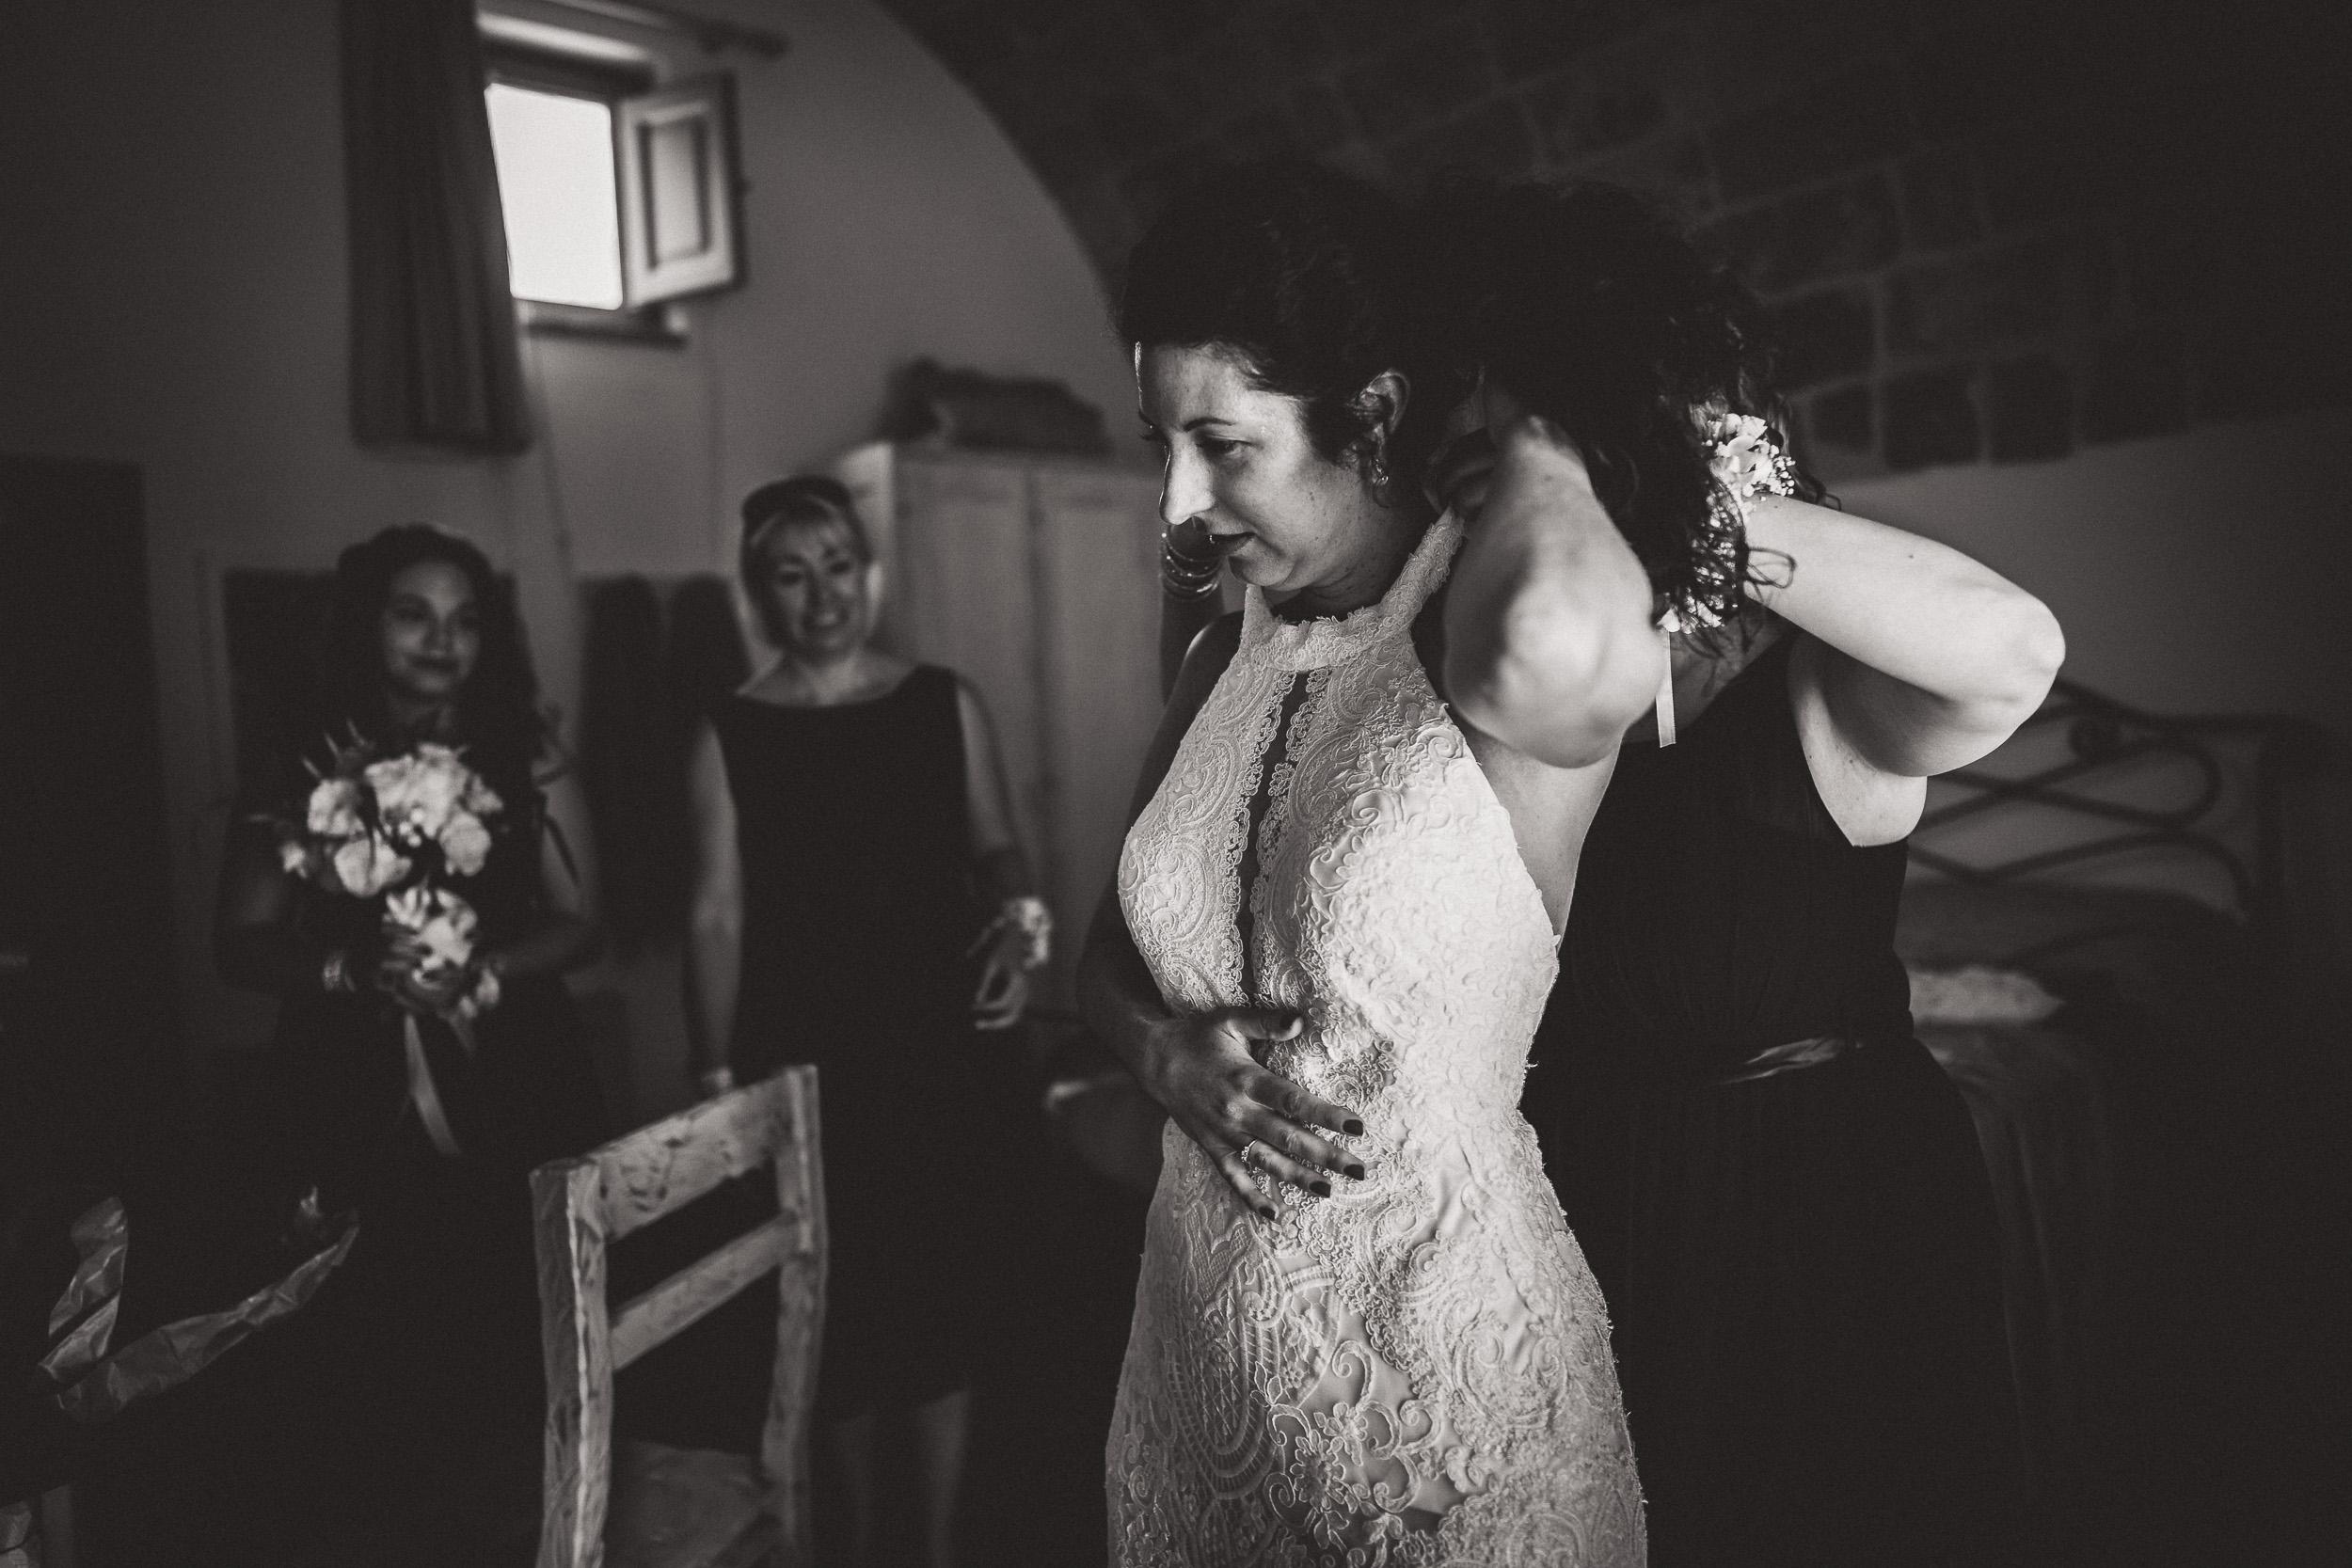 Destination wedding photography | Anna & Nigel destination wedding photography 028